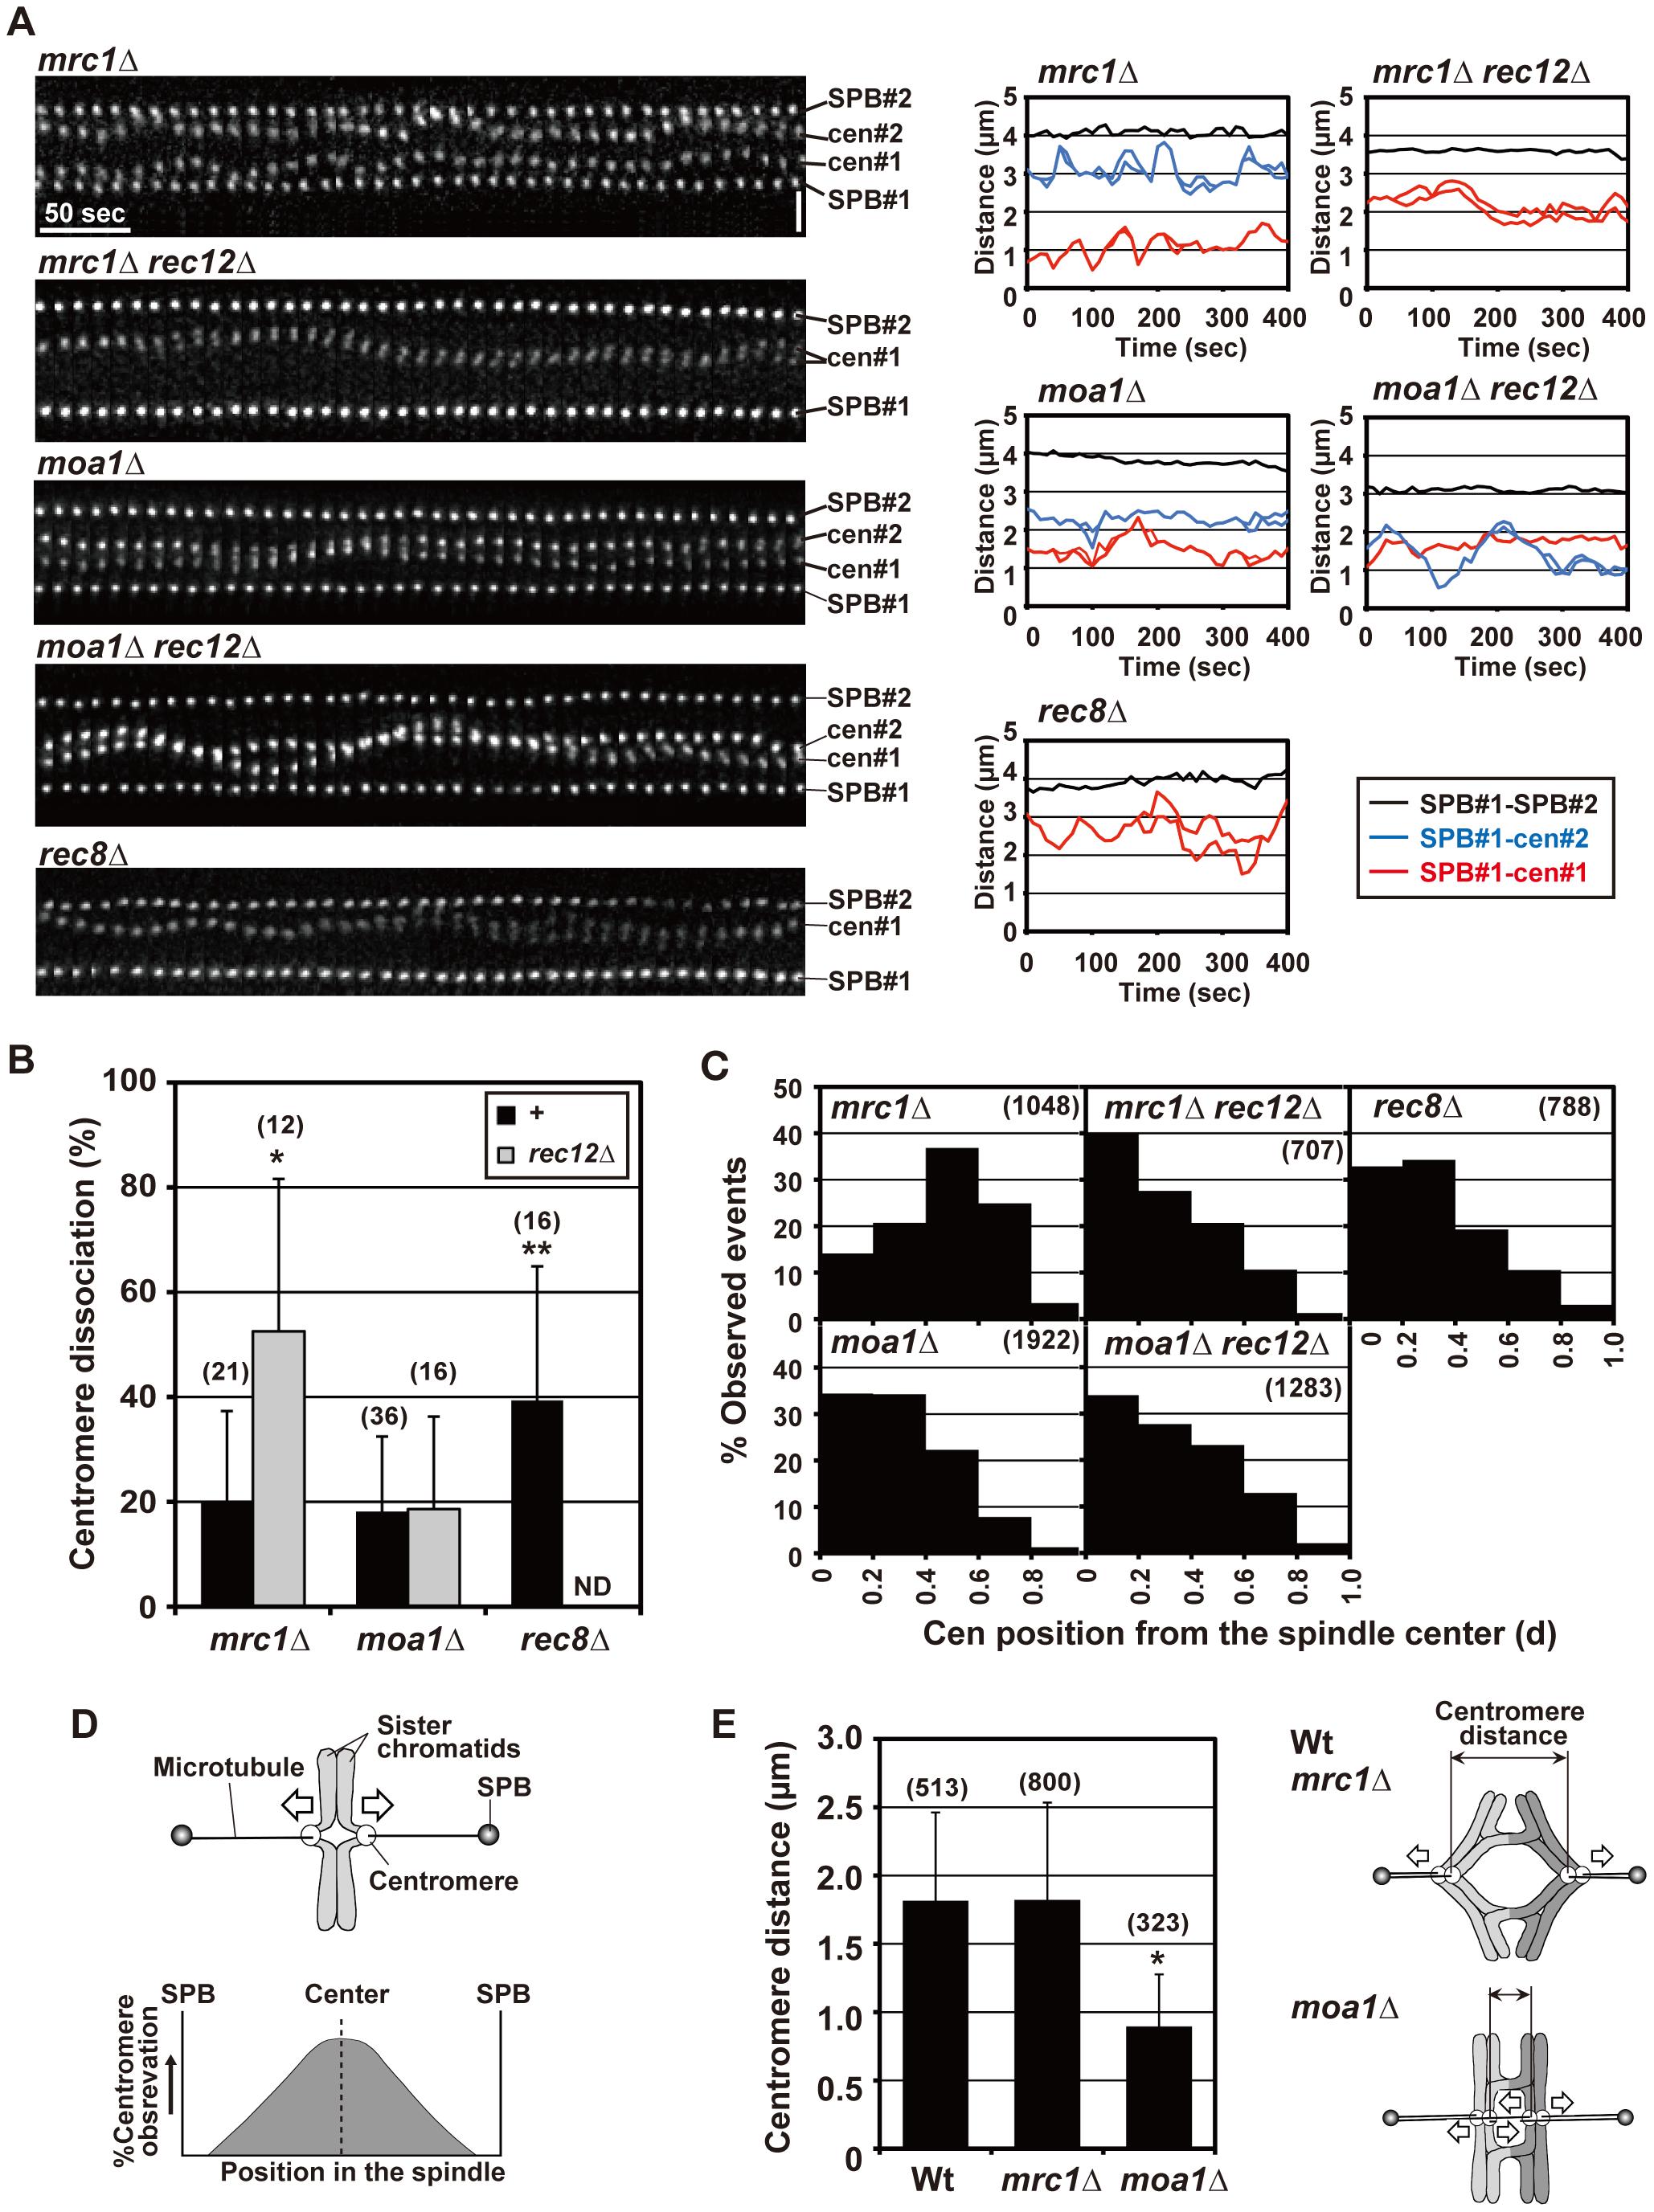 Pre-anaphase centromere dynamics during meiosis I in <i>mrc1</i> and <i>moa1</i> mutants.